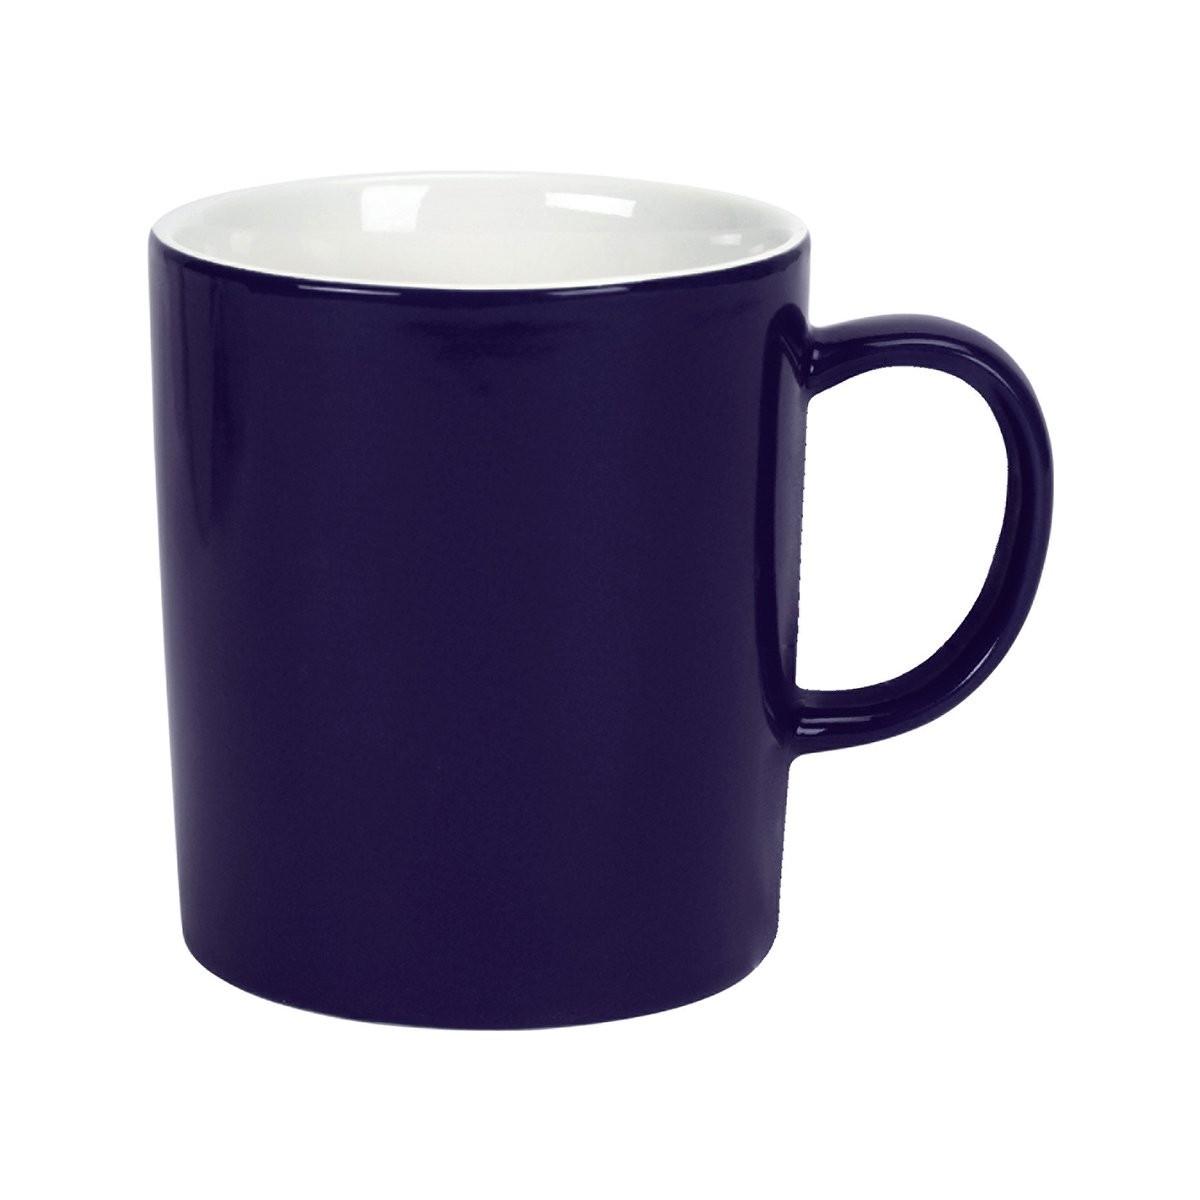 MIX IT! Hrnek na kávu 250 ml - modrá